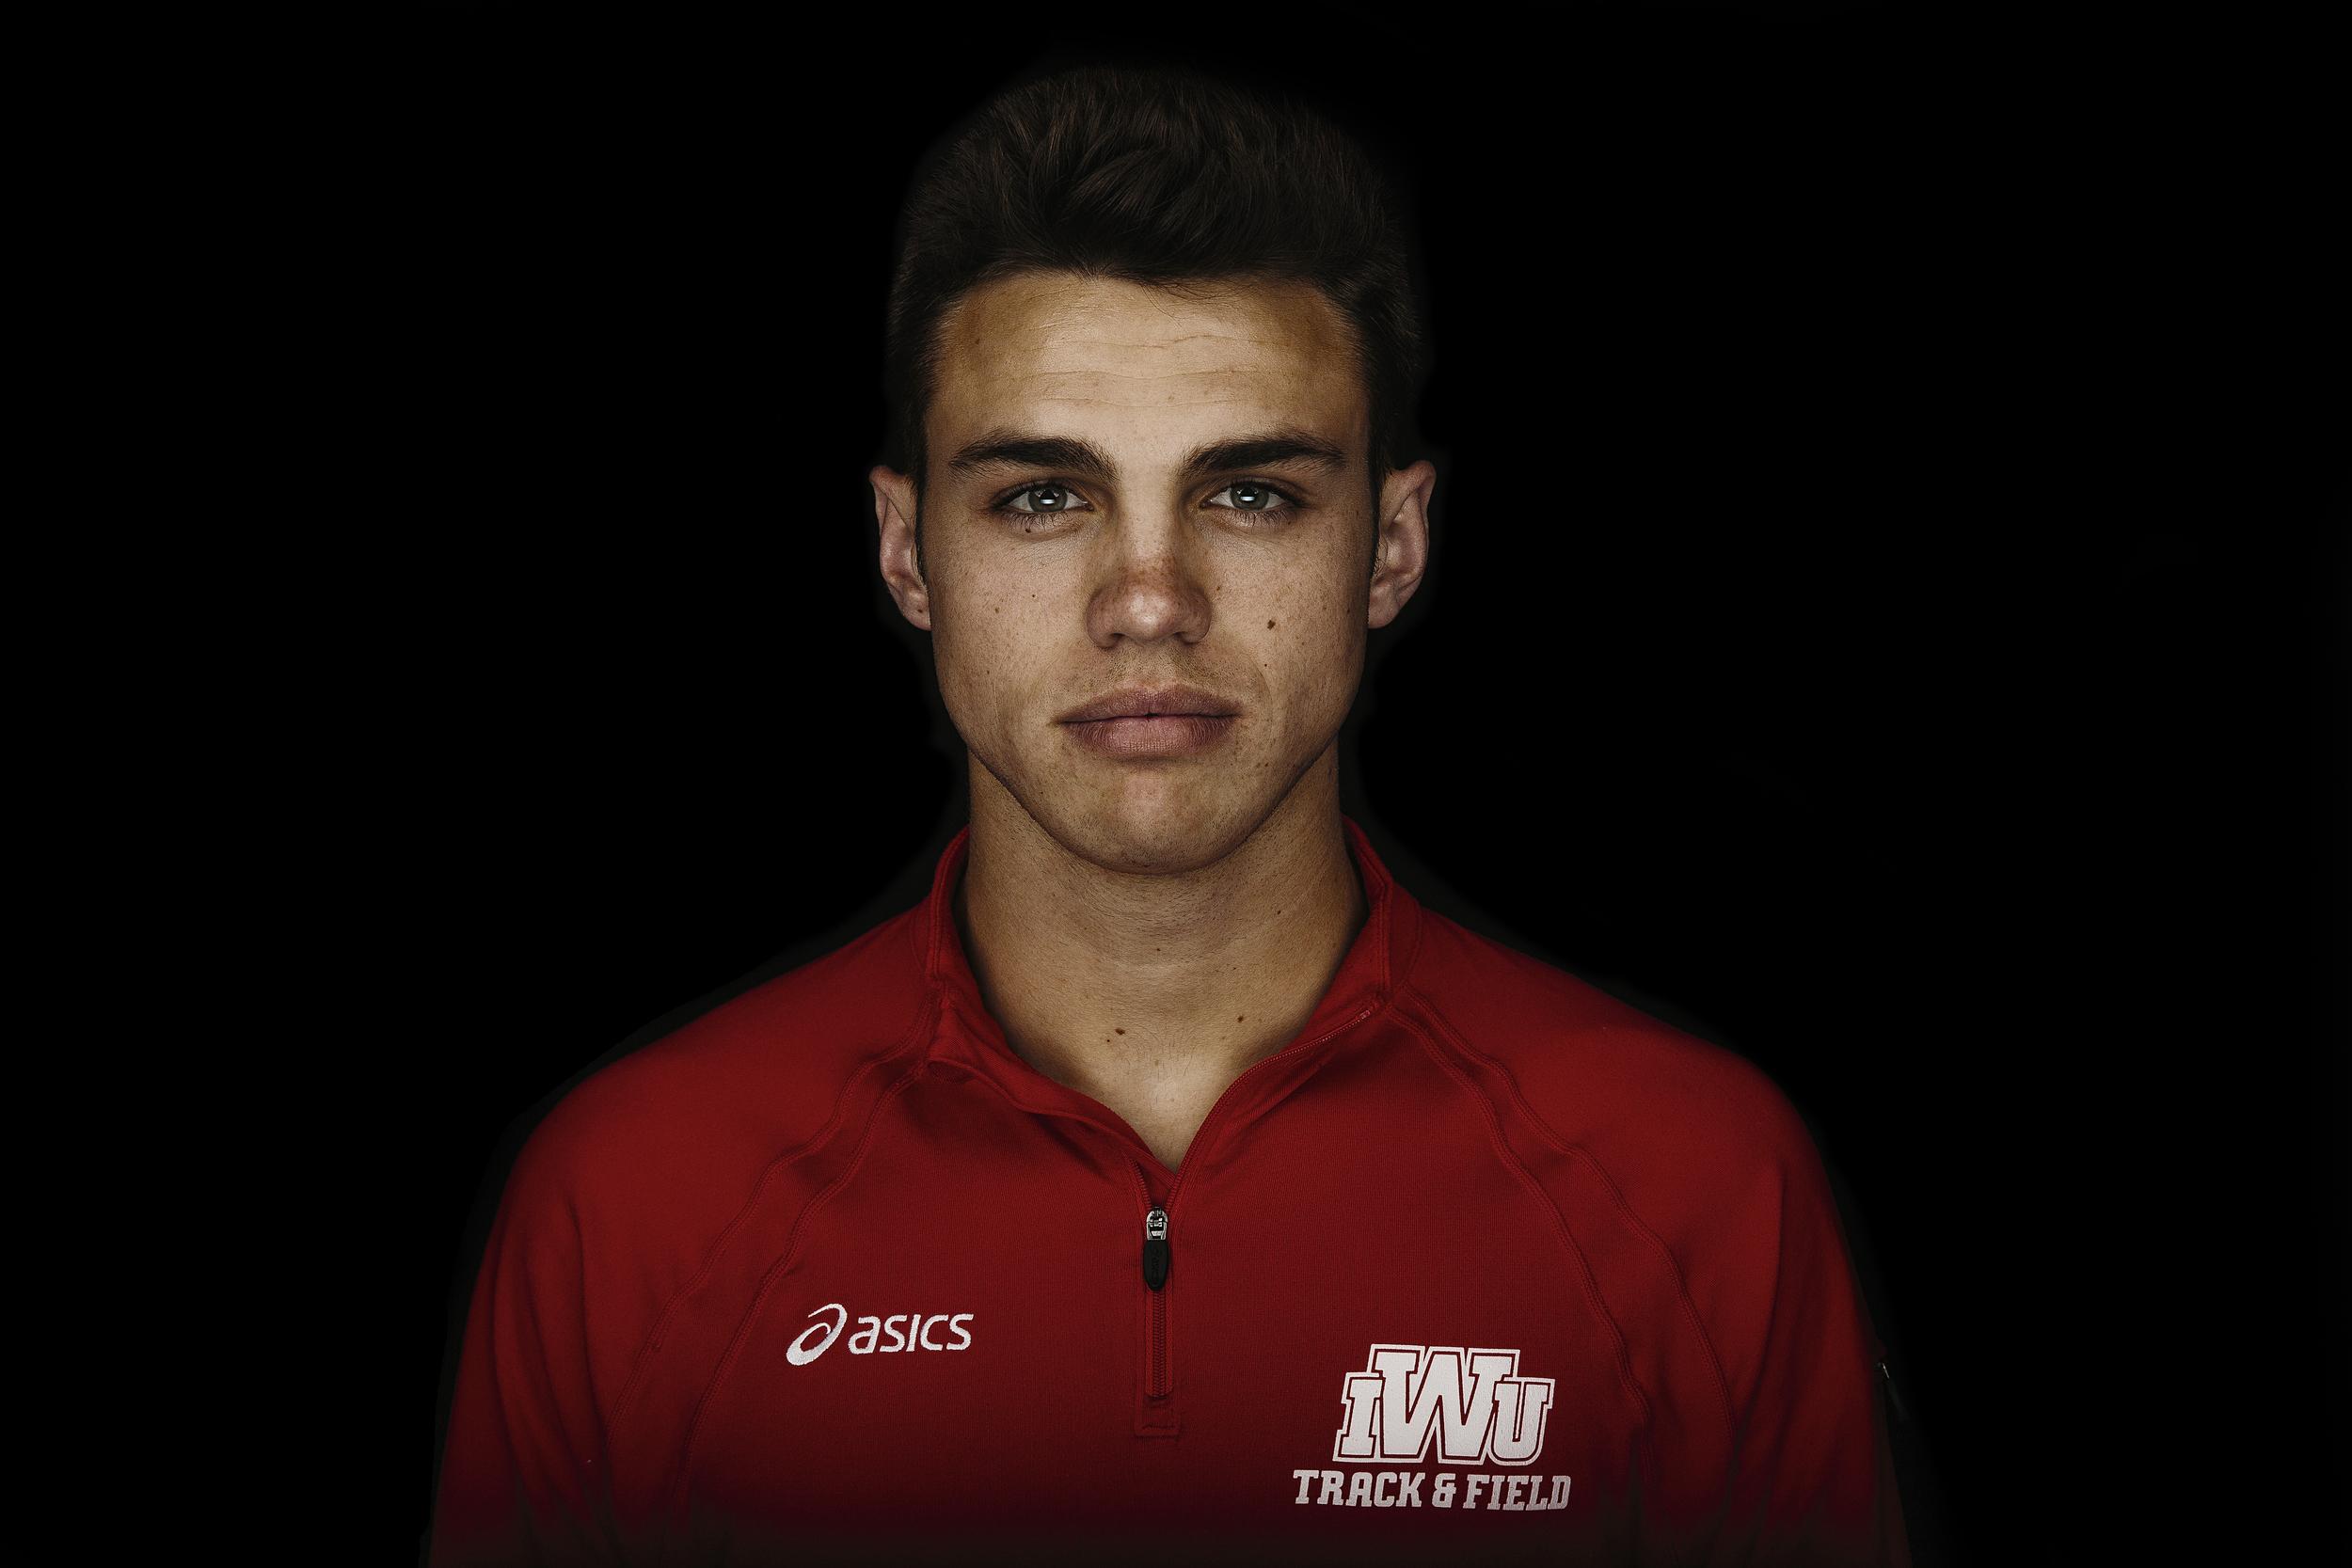 Jake  Sport: Track  Discipline: Hurdles